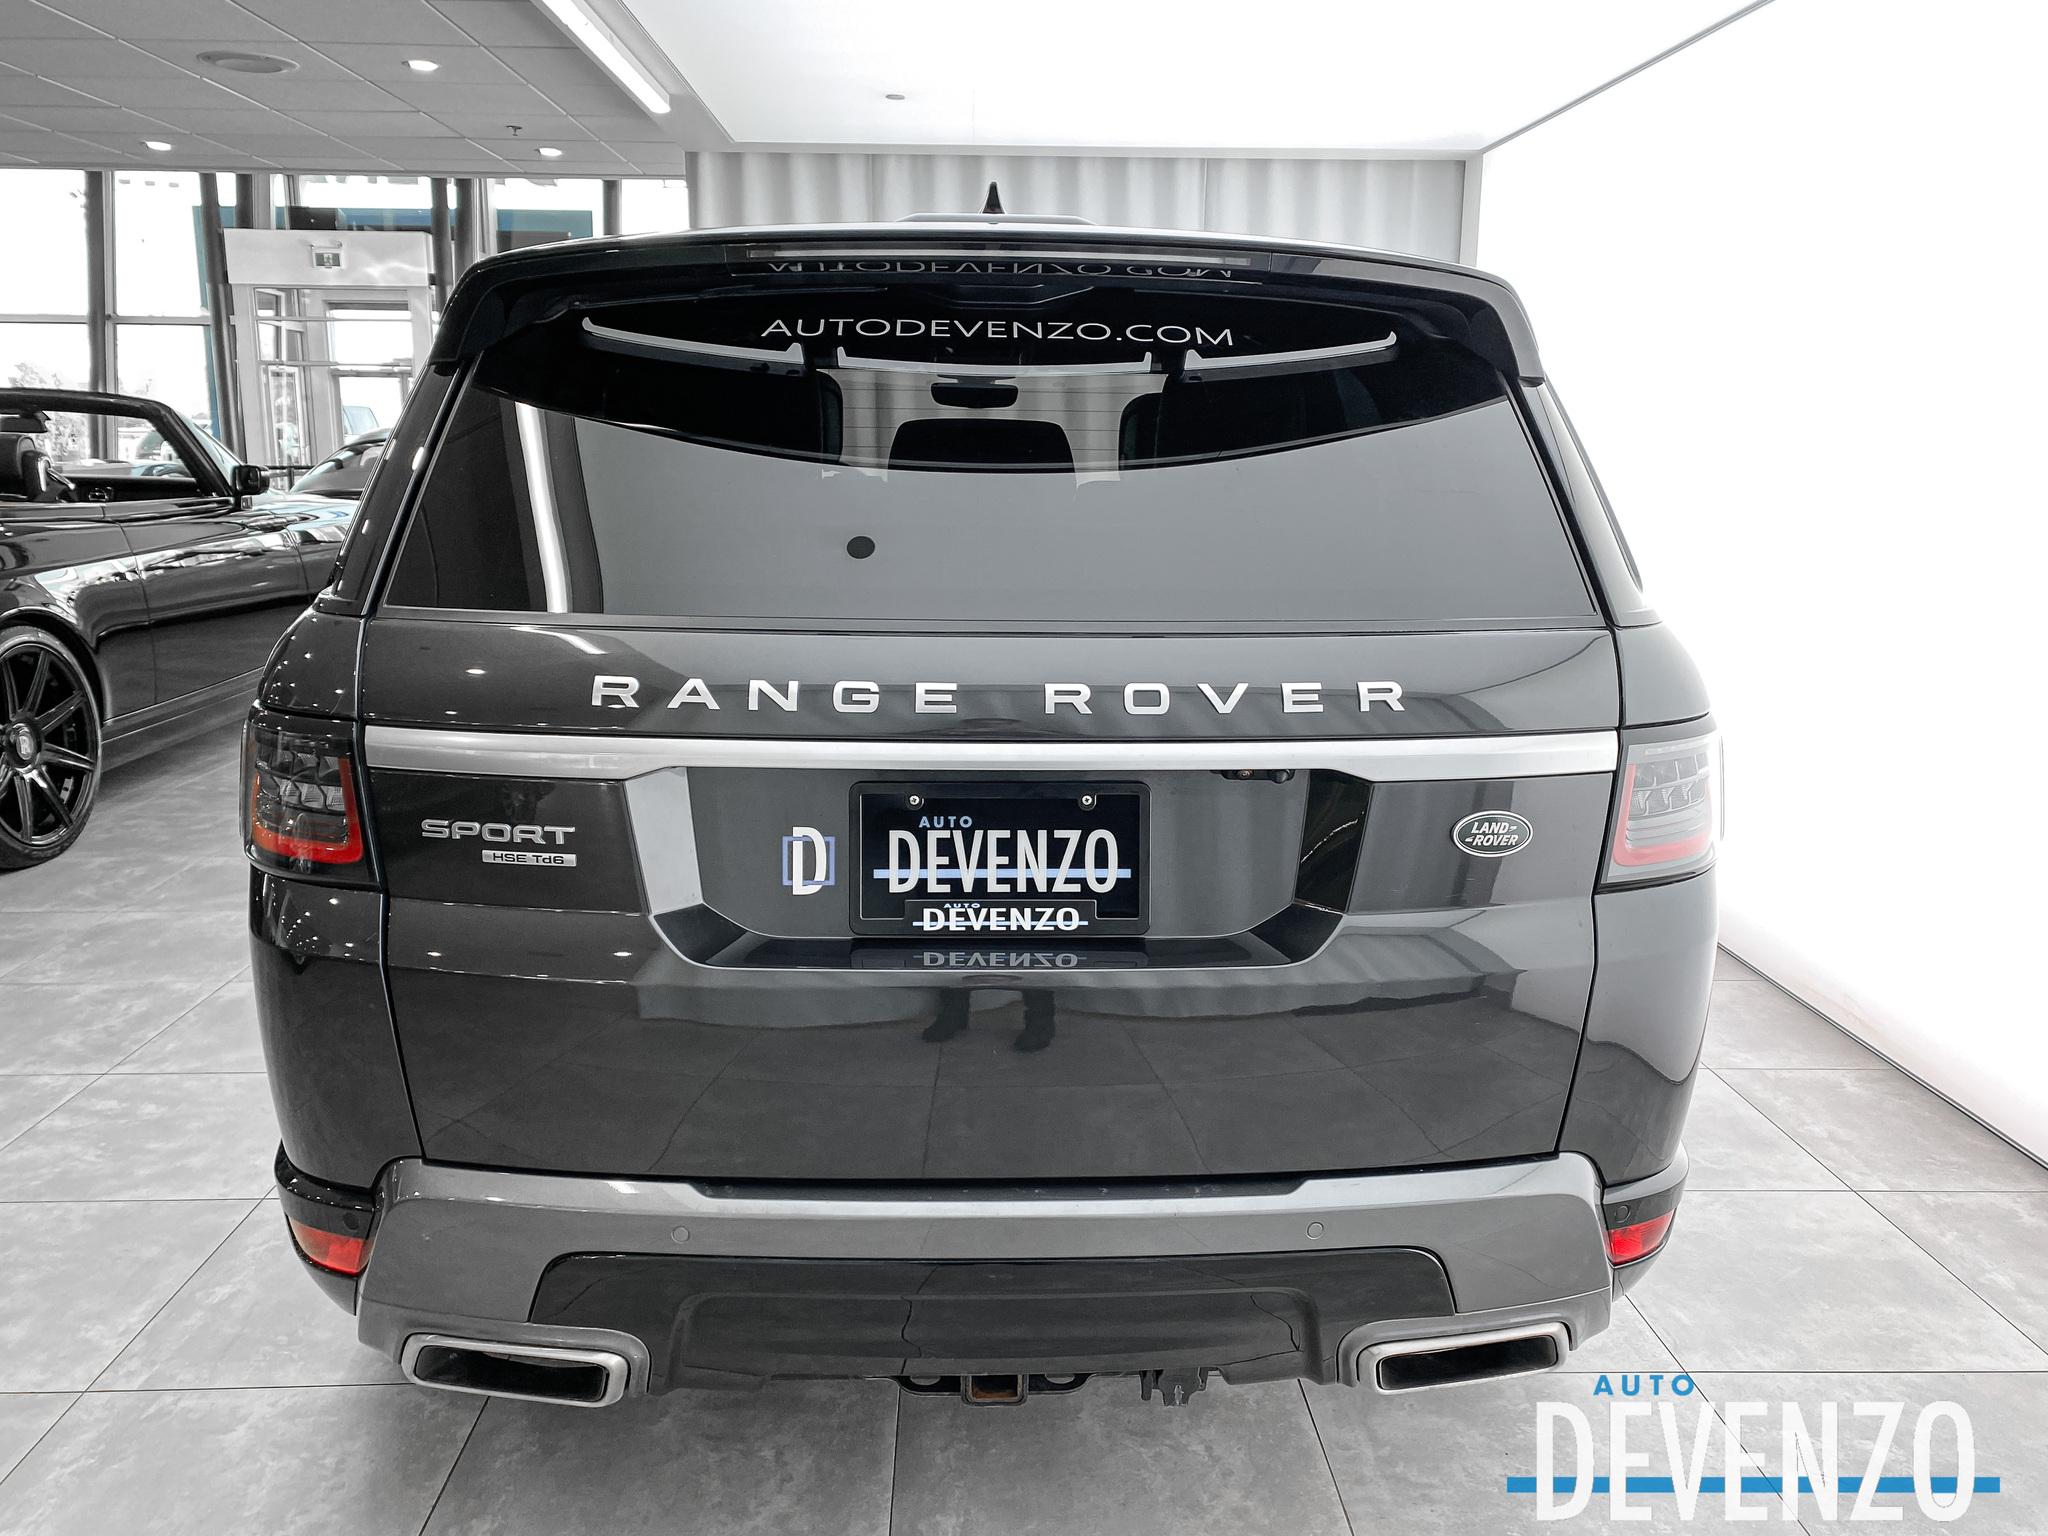 2018 Land Rover Range Rover Sport Td6 Diesel HSE Drive Pack / Vision Assist complet